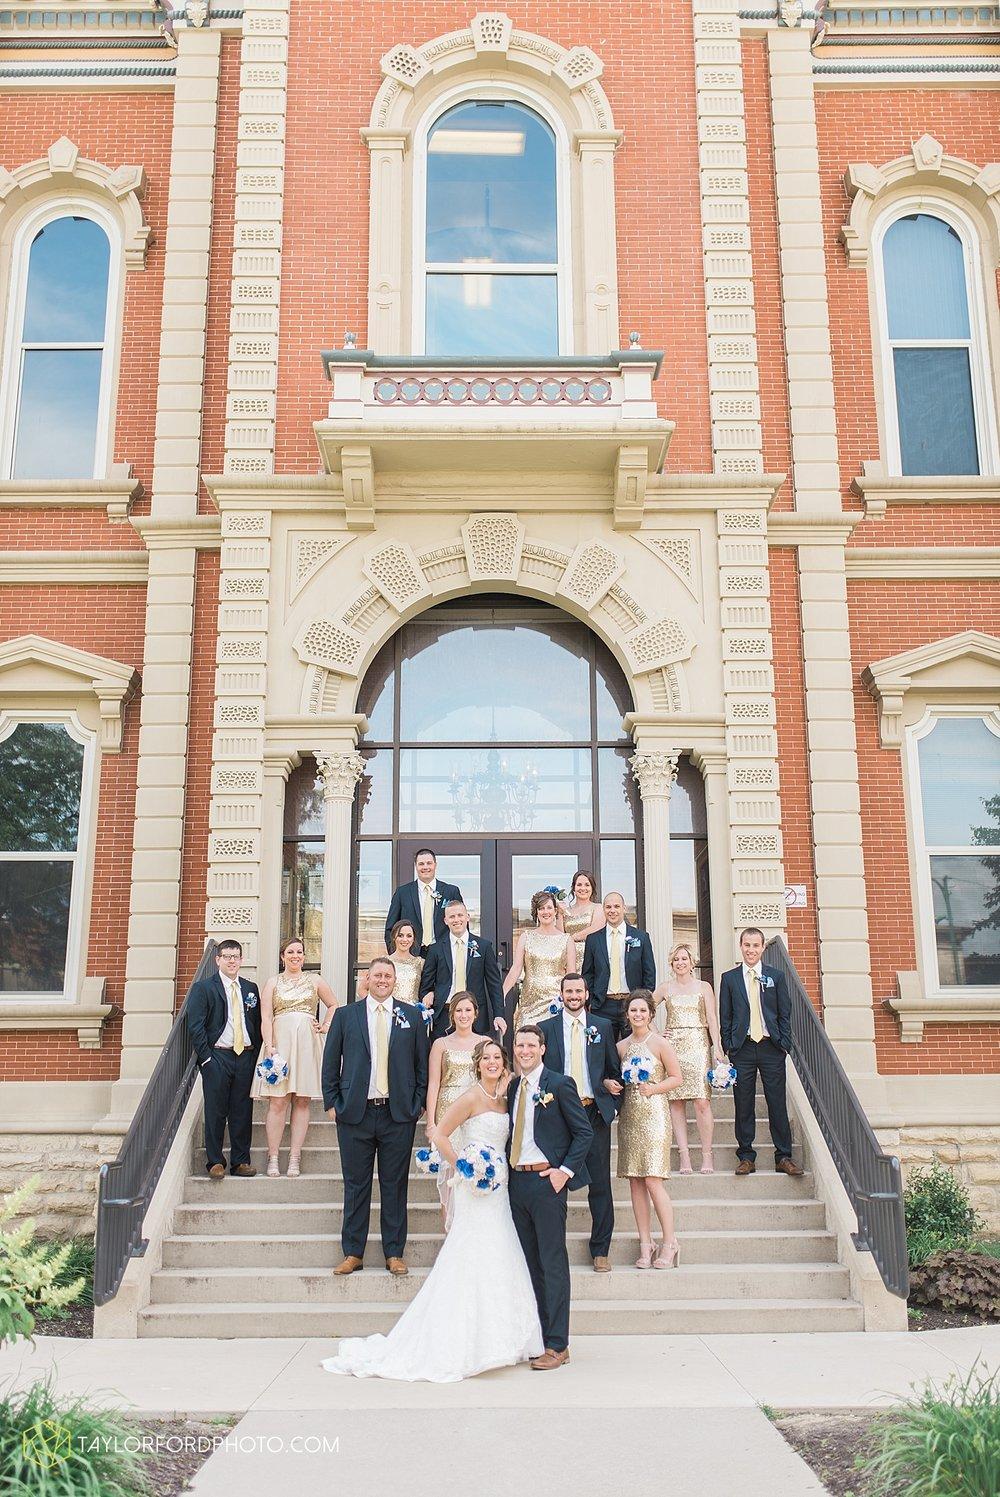 van-wert-ohio-decatur-indiana-wedding-photographer-the-mirage-banquet-hall-taylor-ford-photography_2512.jpg